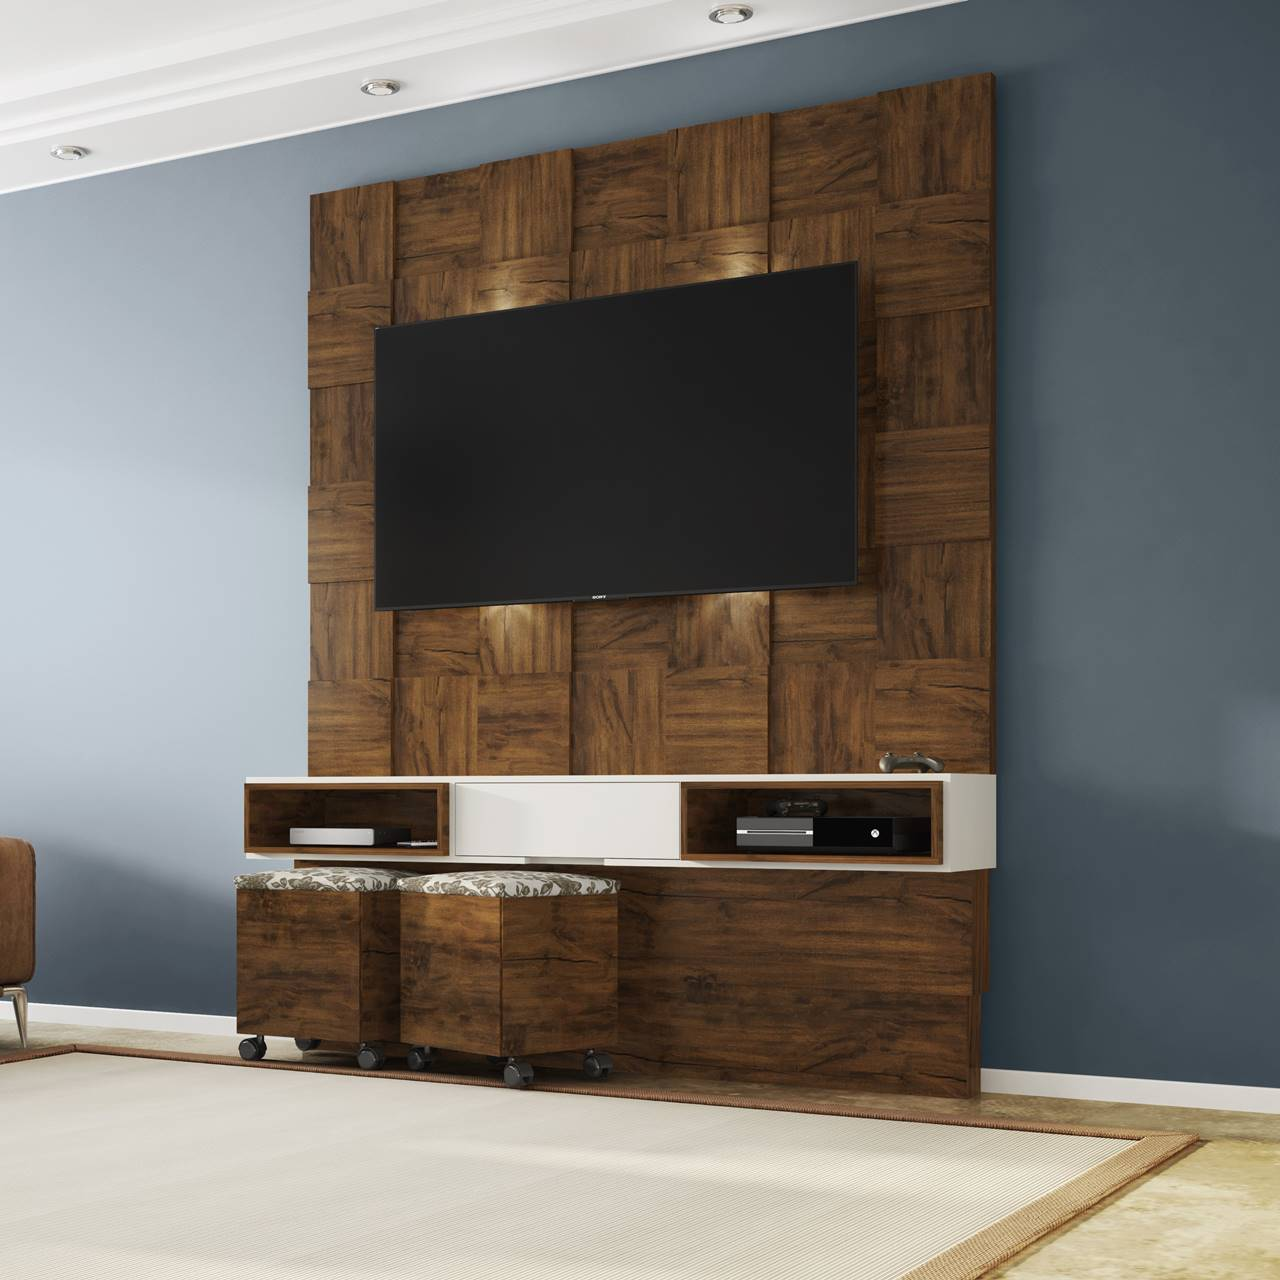 "Painel Home Suspenso p/ TV até 55"" com LED TB125L Dalla Costa Nobre/Offwhite"